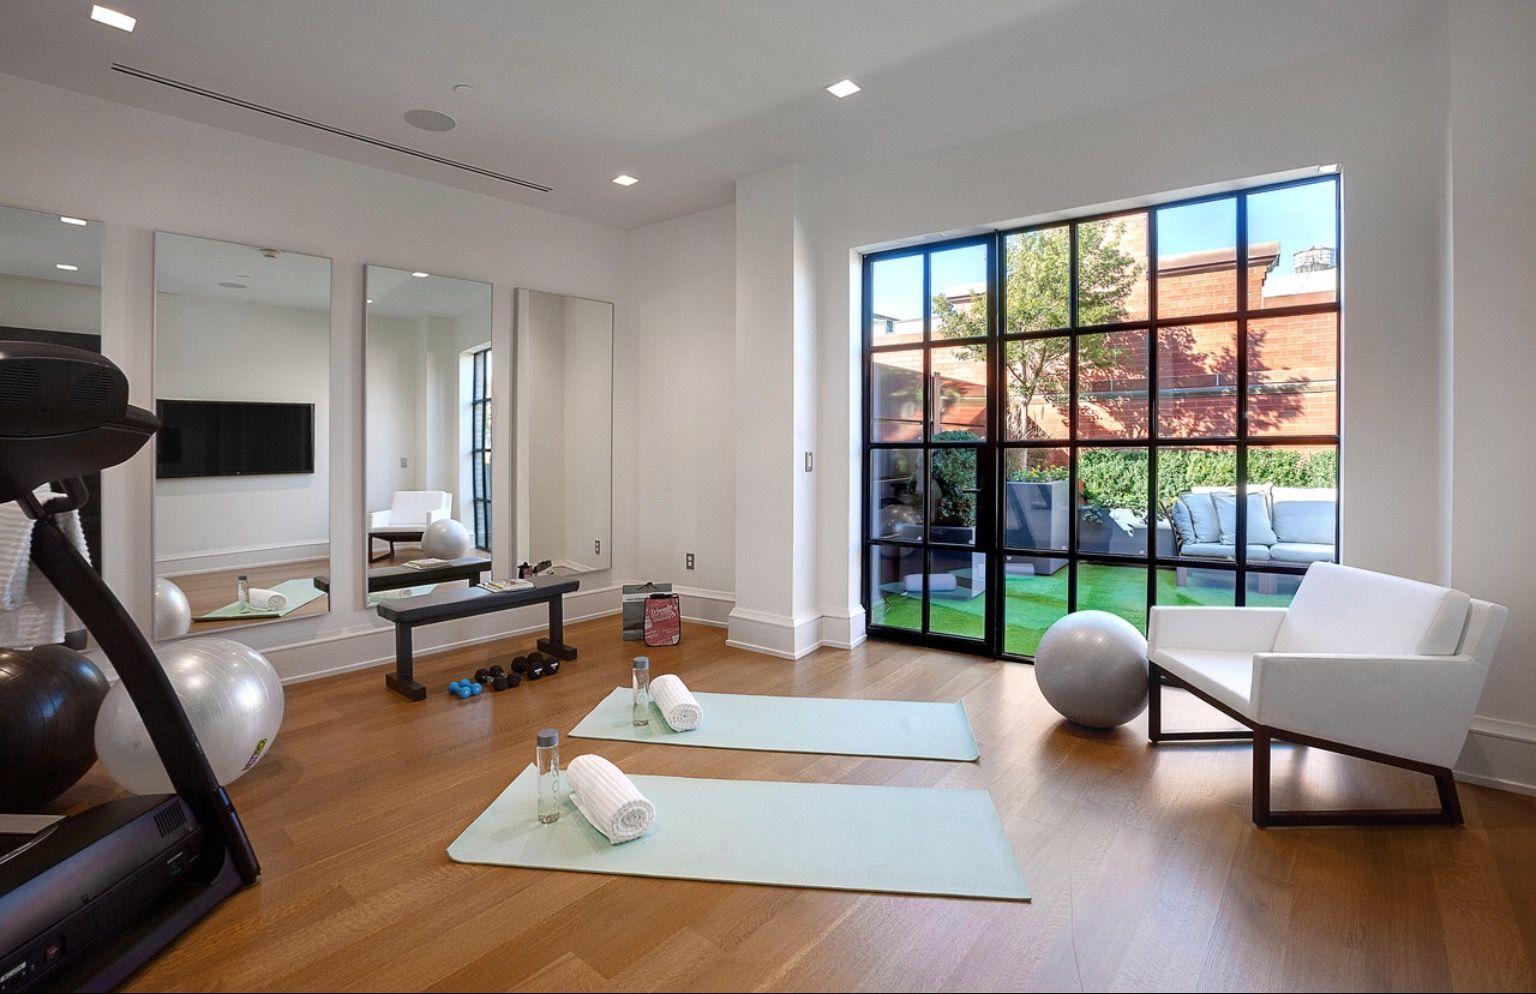 3 Bedroom Apartment Nyc Price